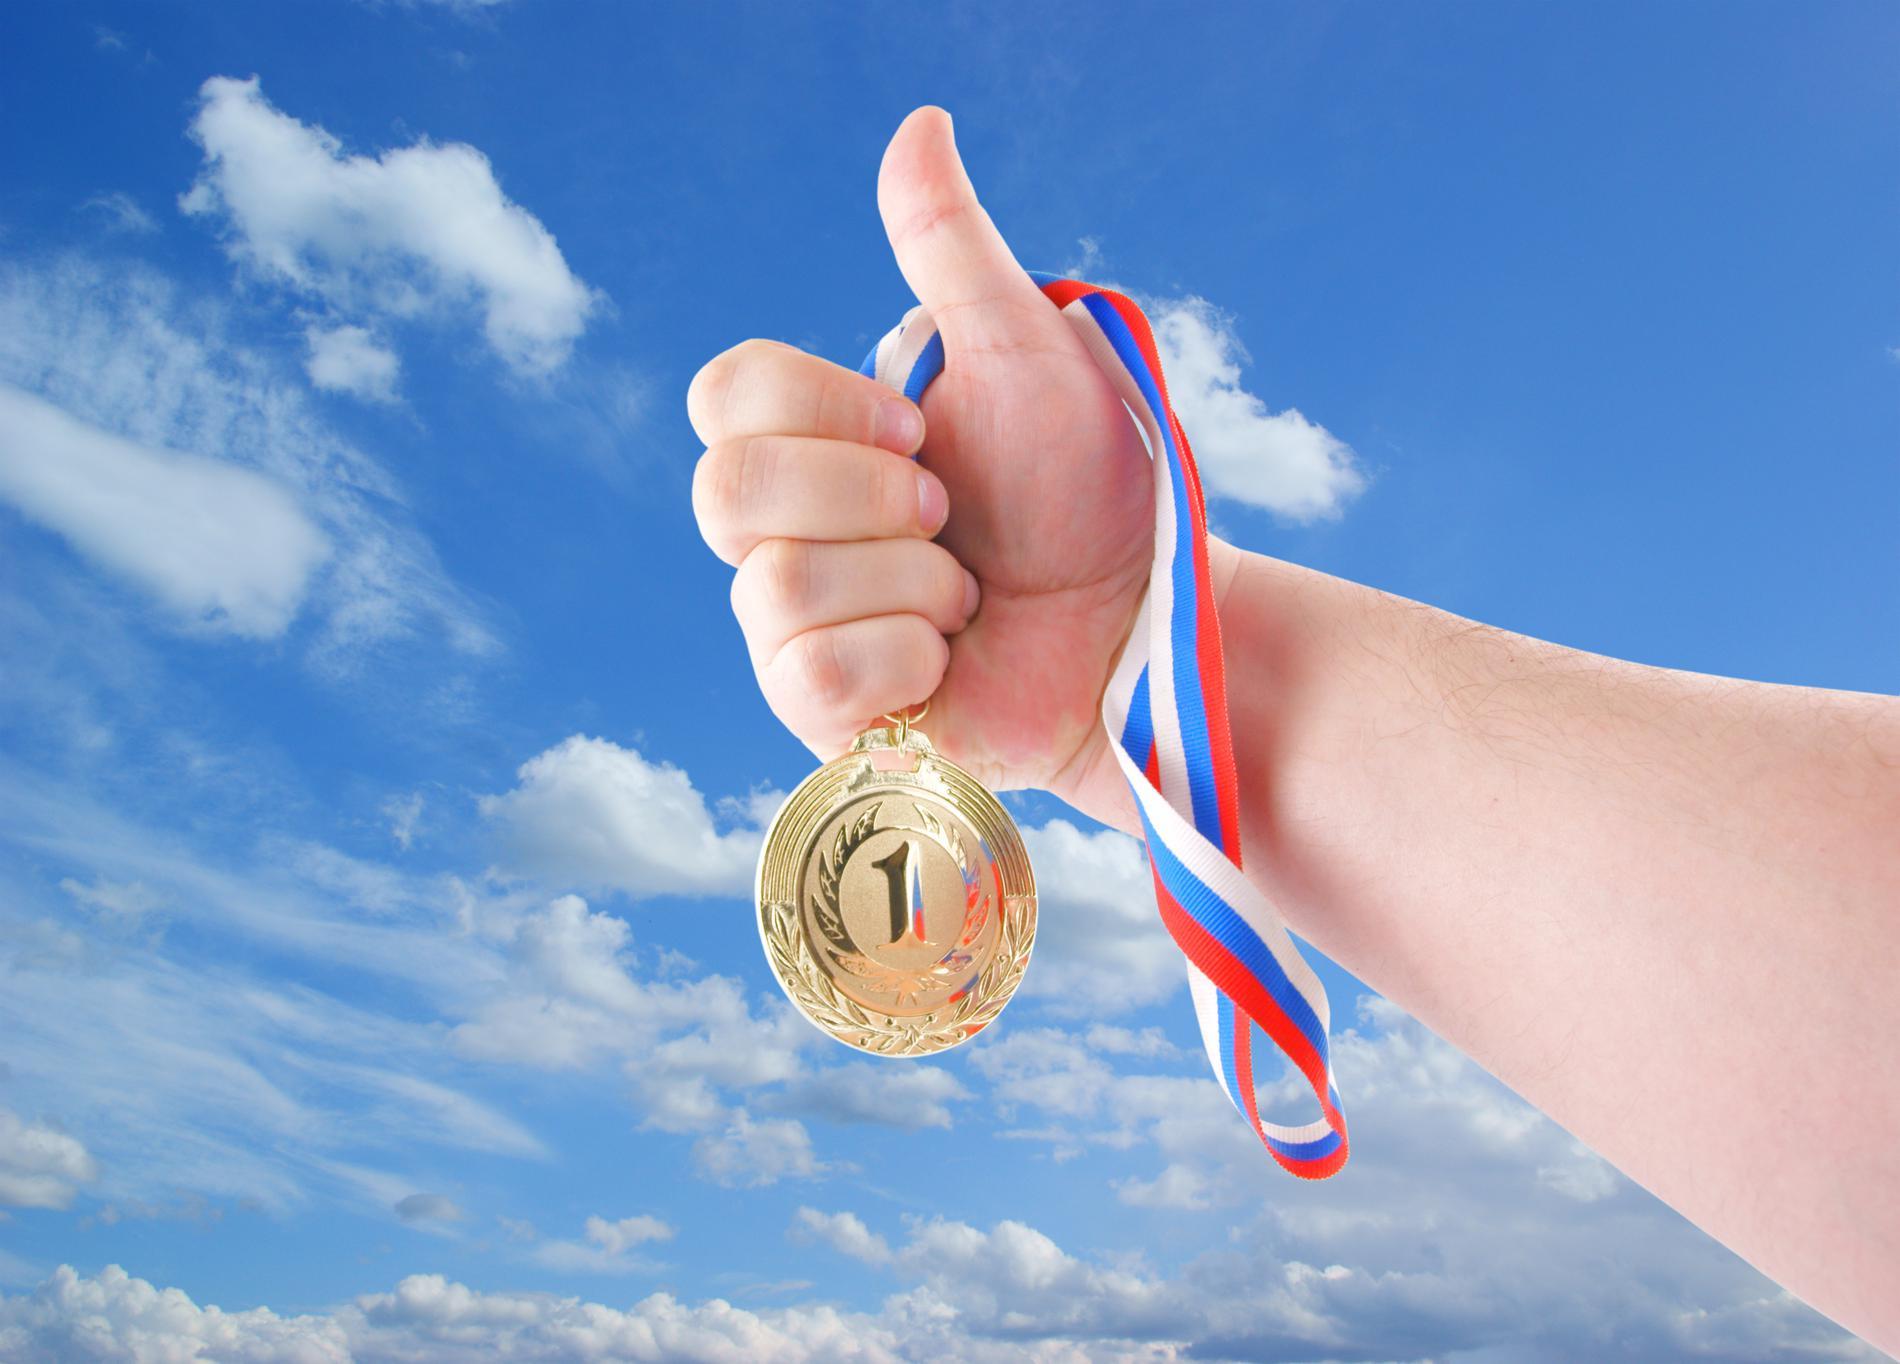 картинки на тему победа в спорте конце